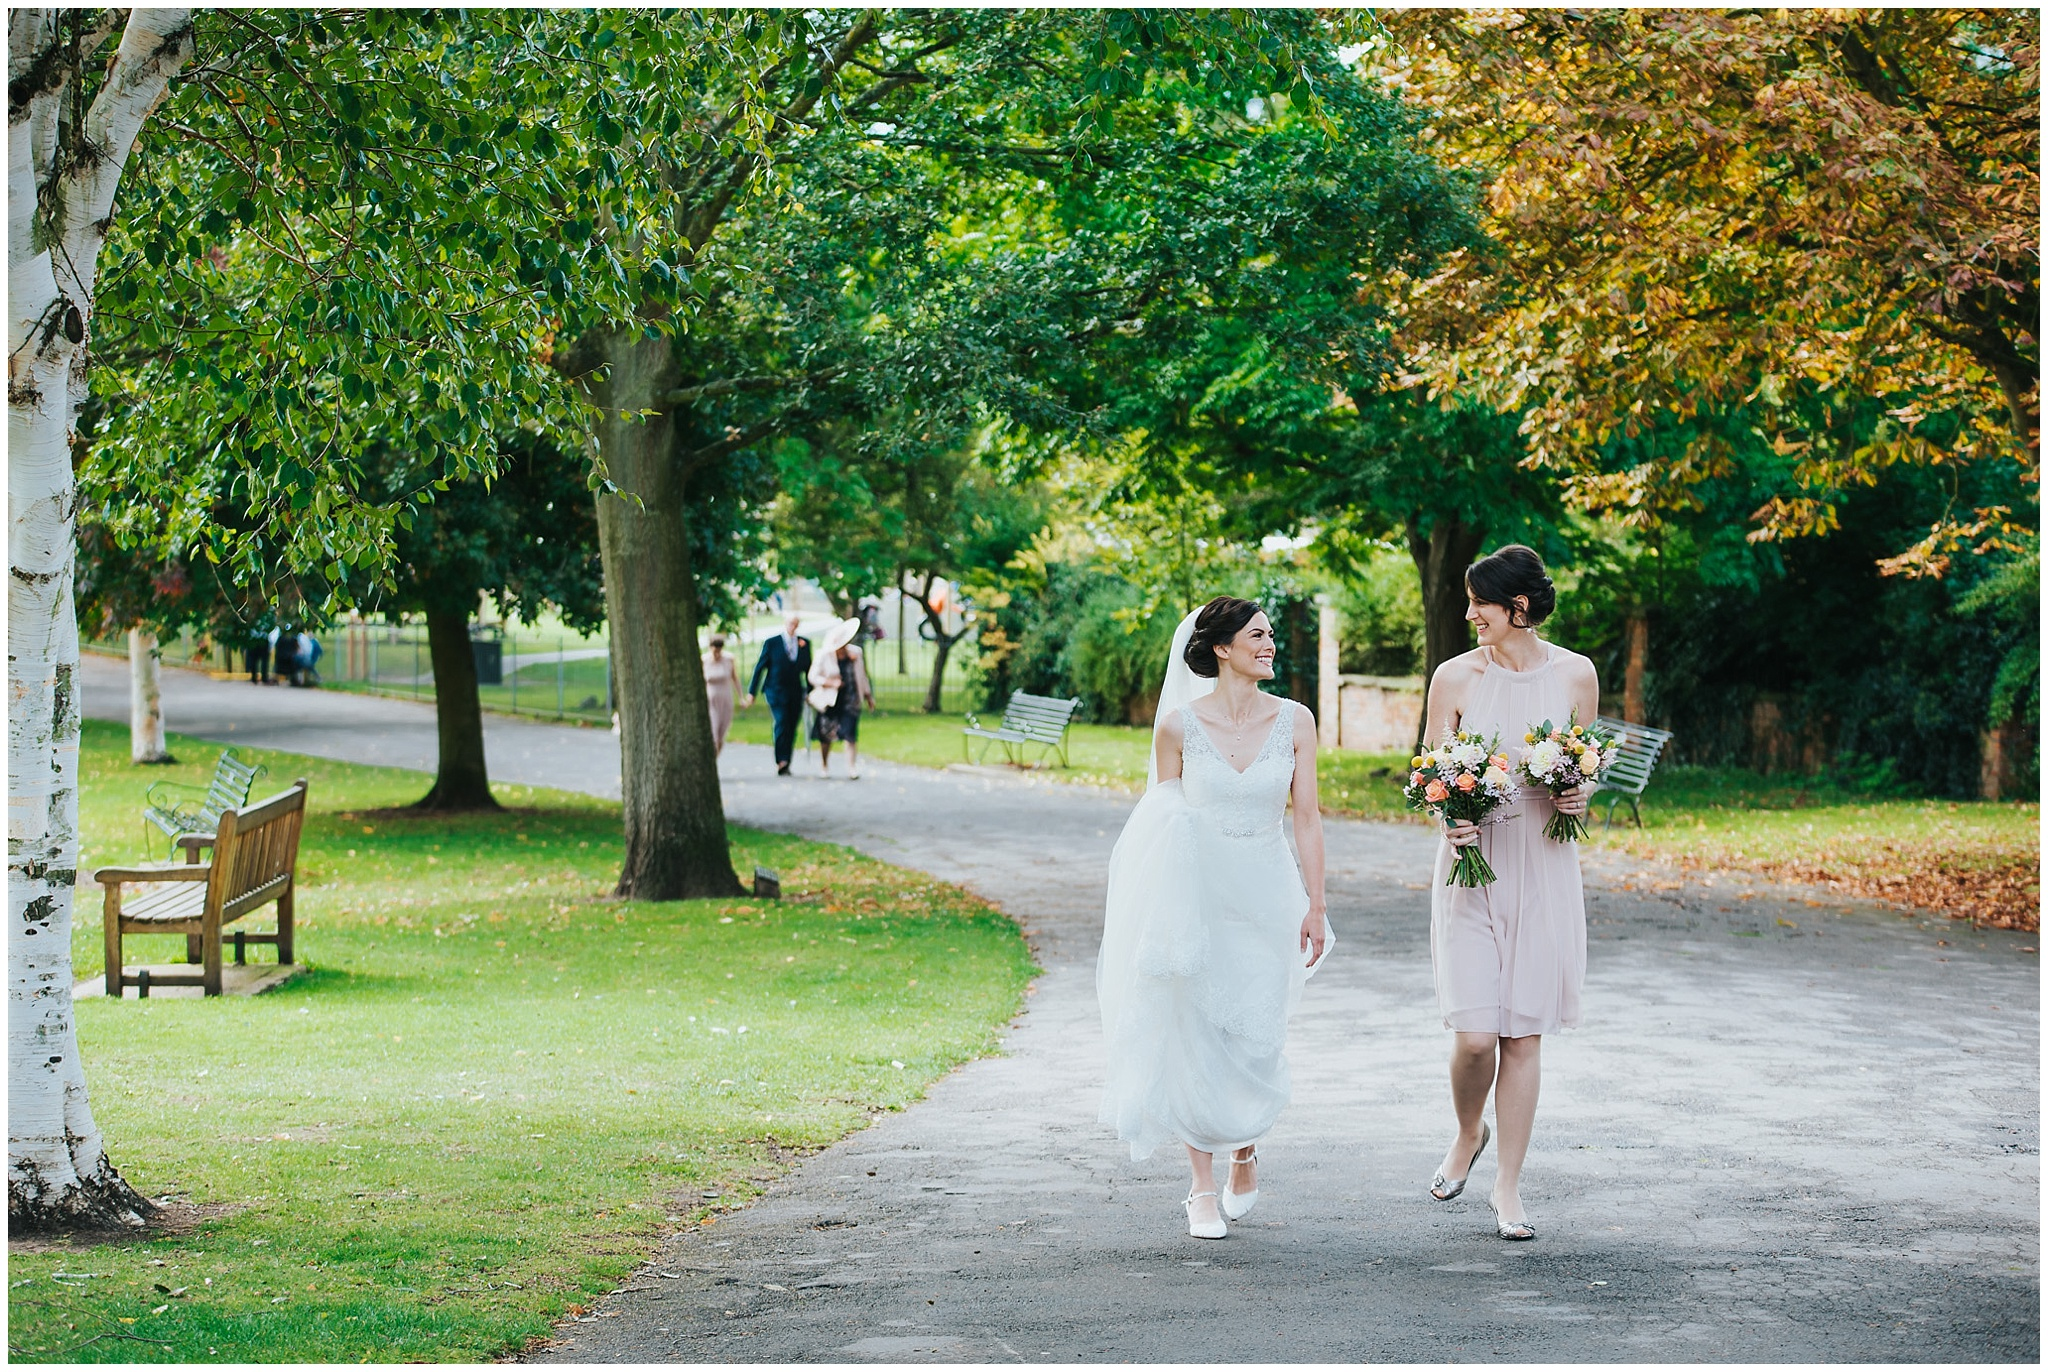 Stanway House Gloucester wedding photography027